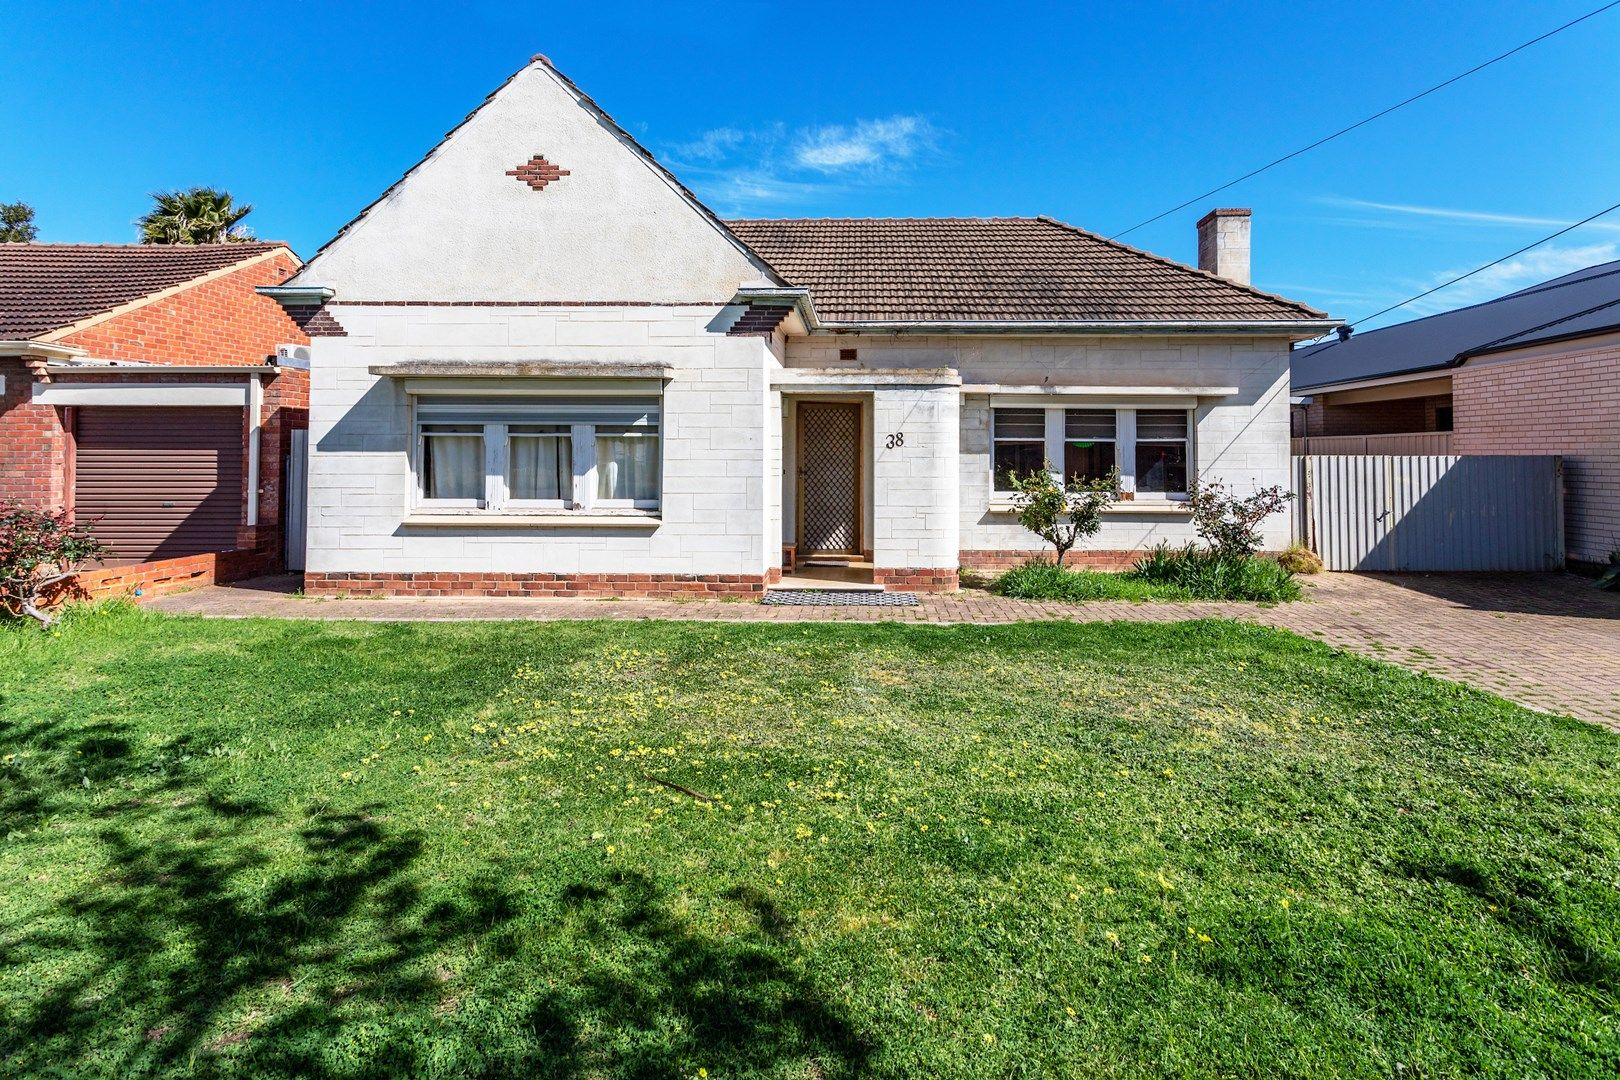 38 La Perouse Avenue, Flinders Park SA 5025, Image 0